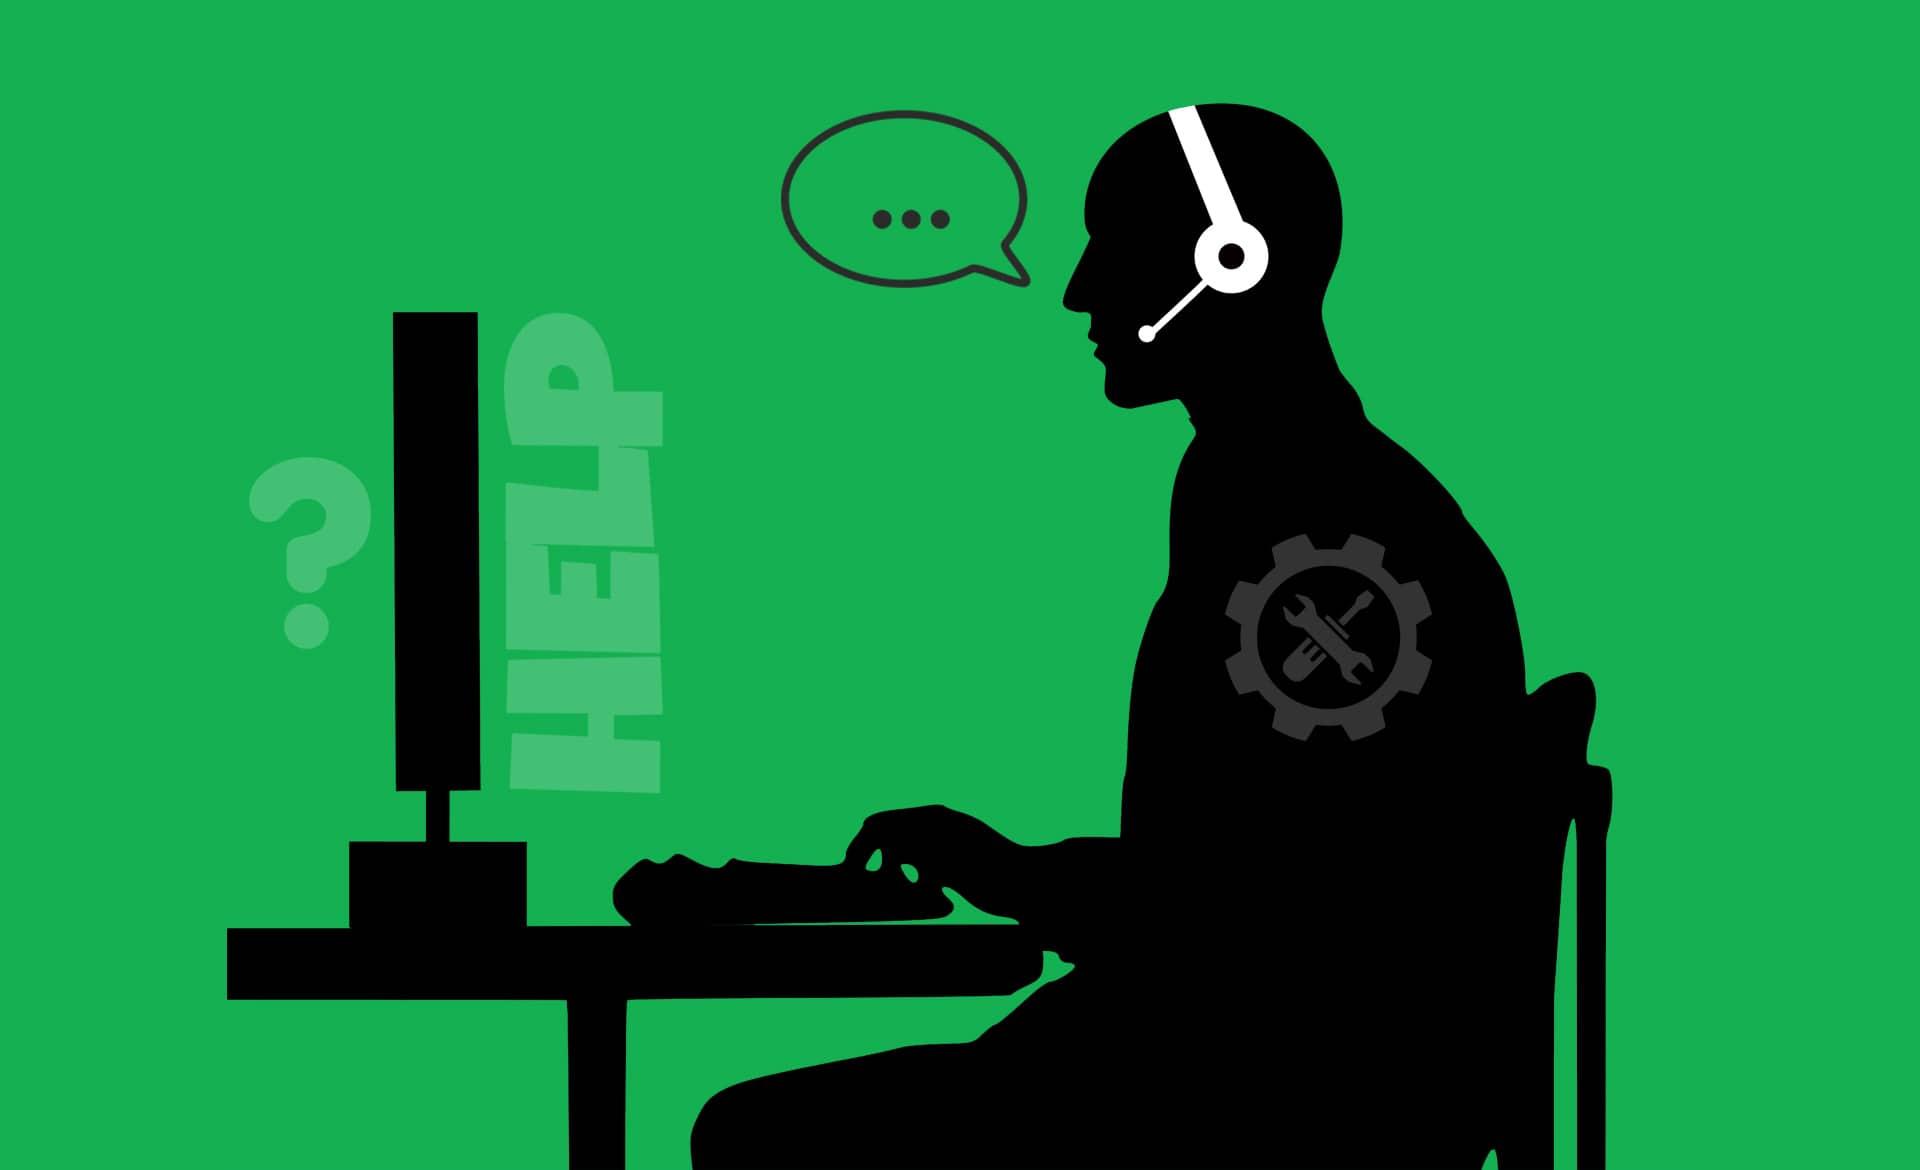 Help Desk - Customer Support